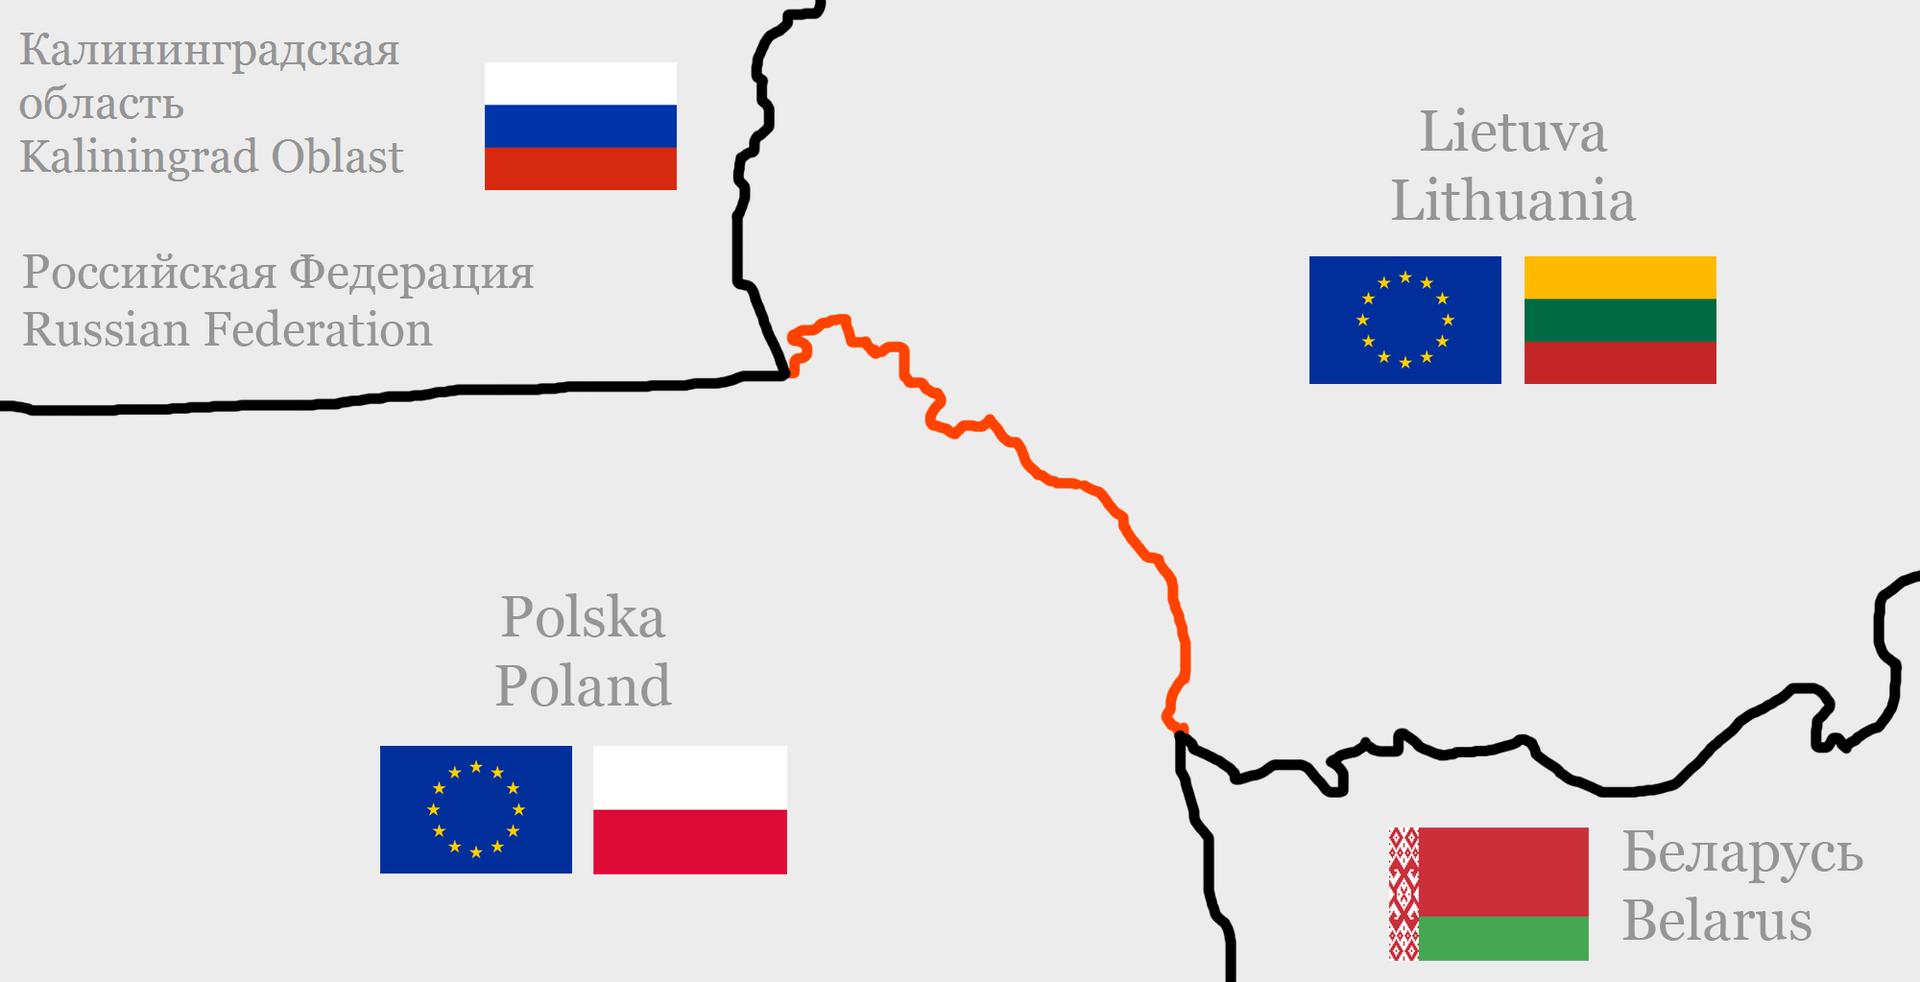 1920px-Granica_polsko-litewska.png